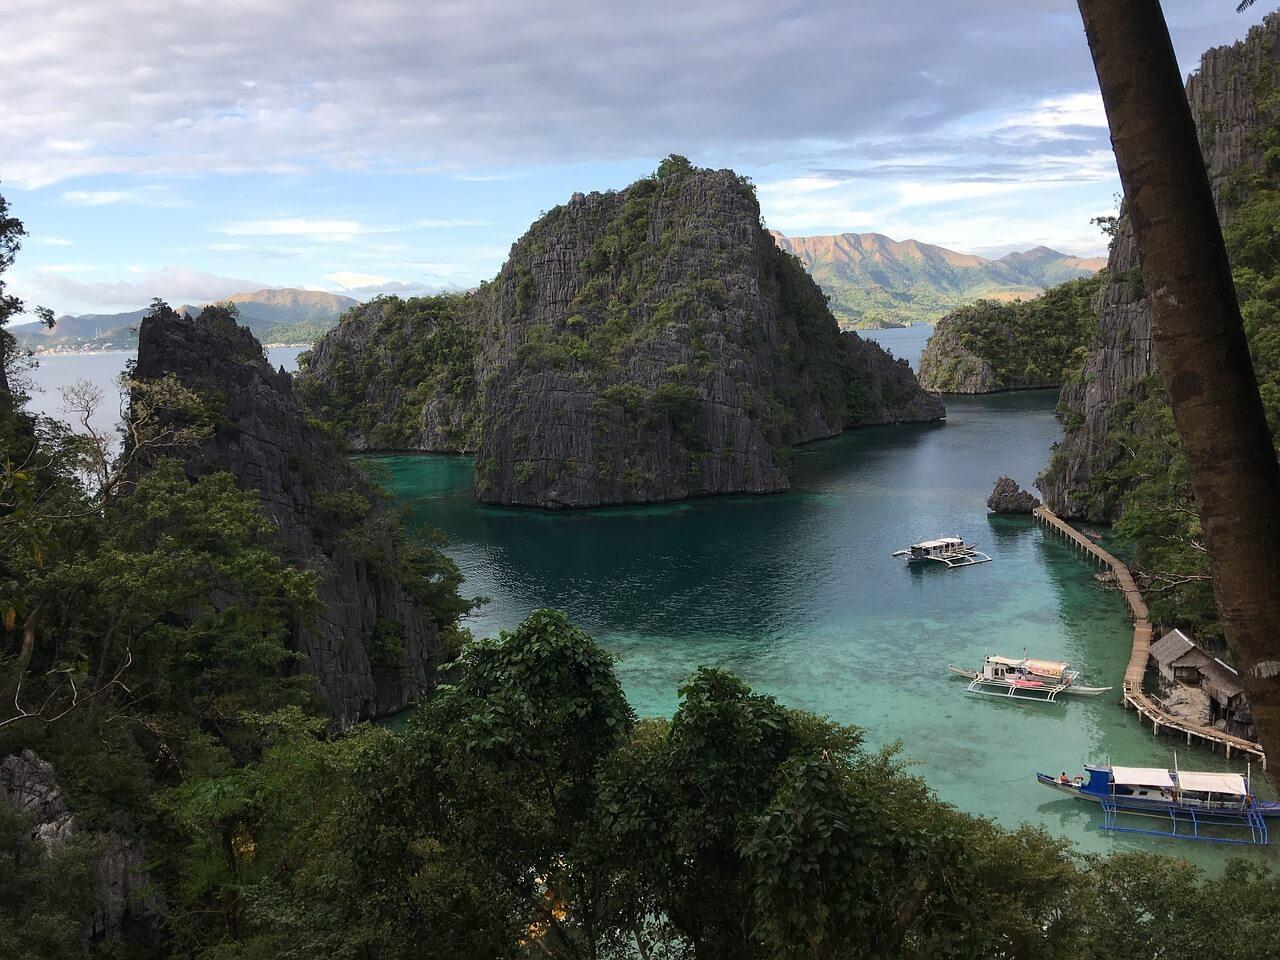 philippines-2021284_1280-1495447651.jpg